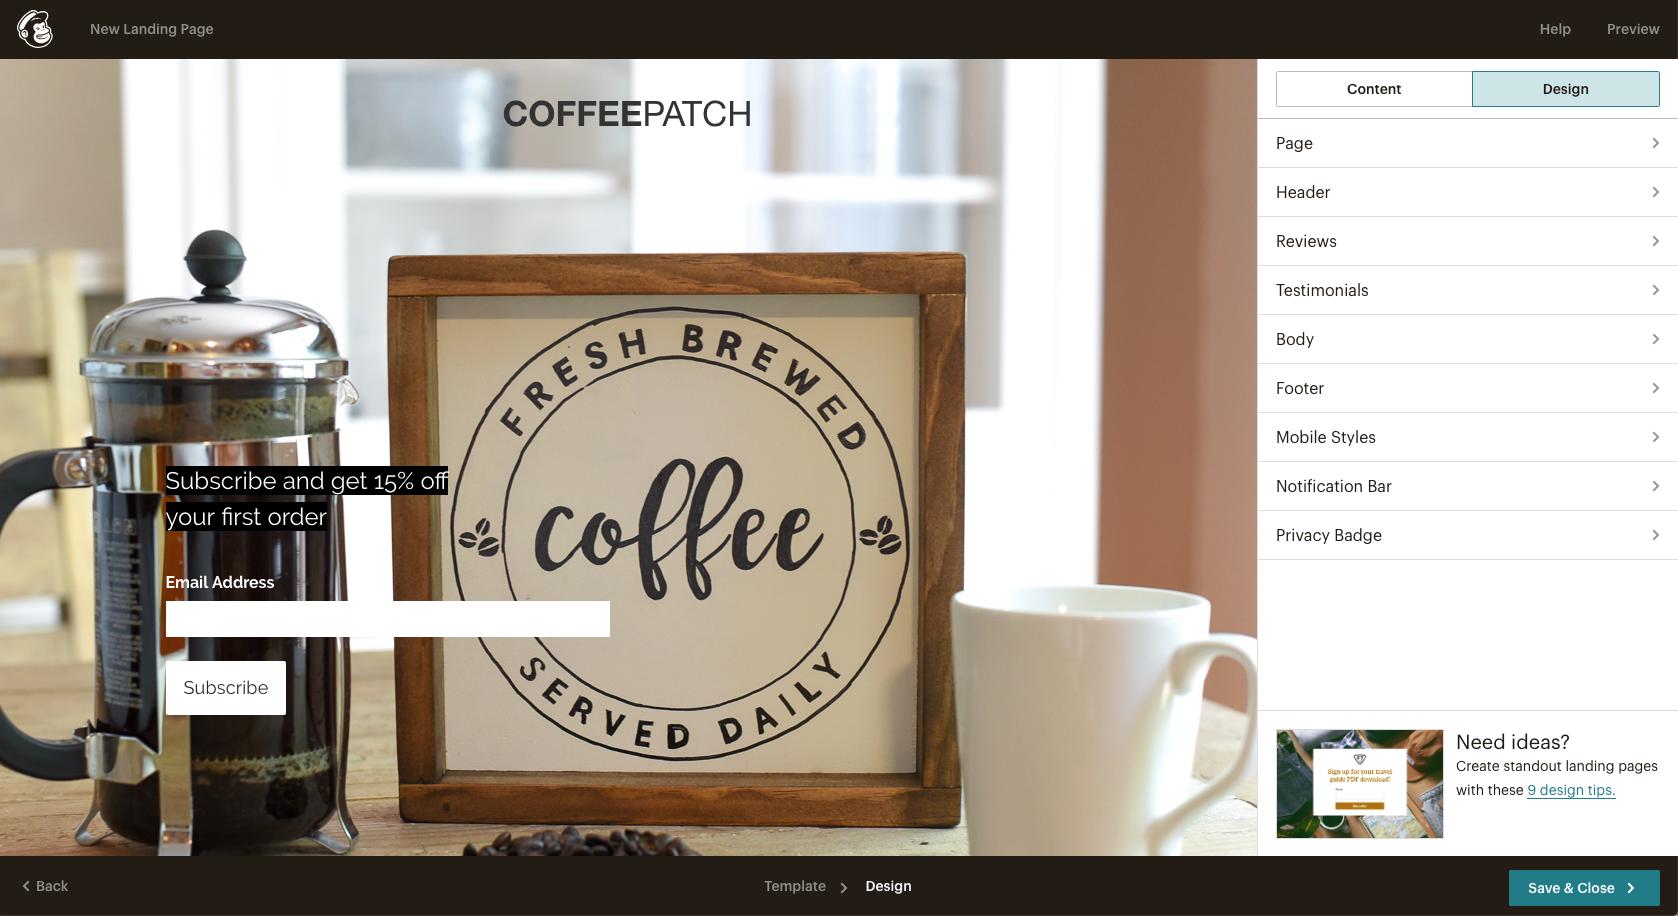 Mailchimp email design interface